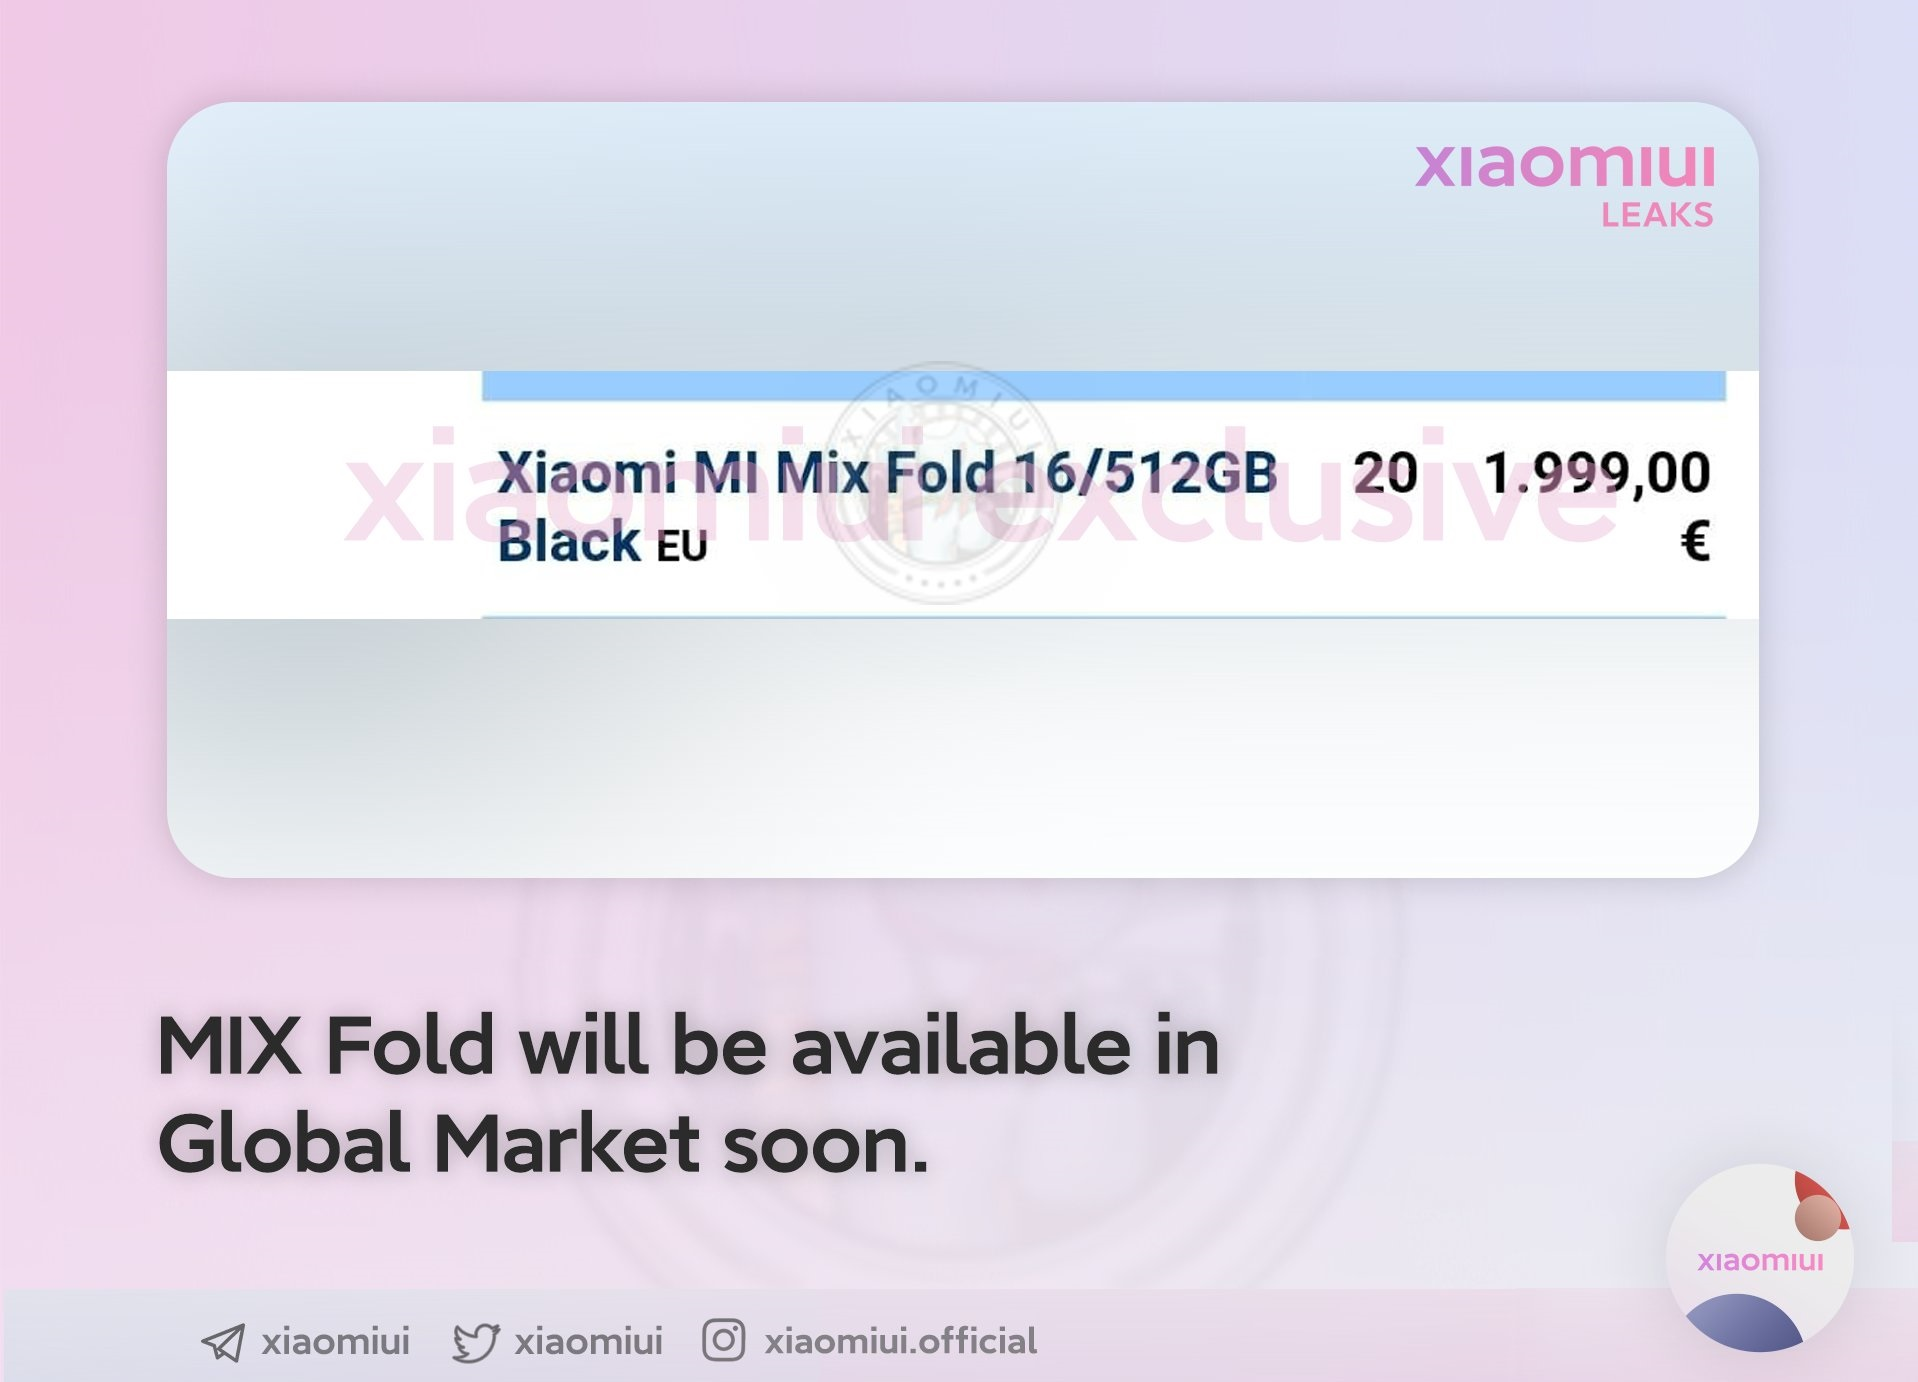 Xiaomi Mi MIX Fold cena w Europie